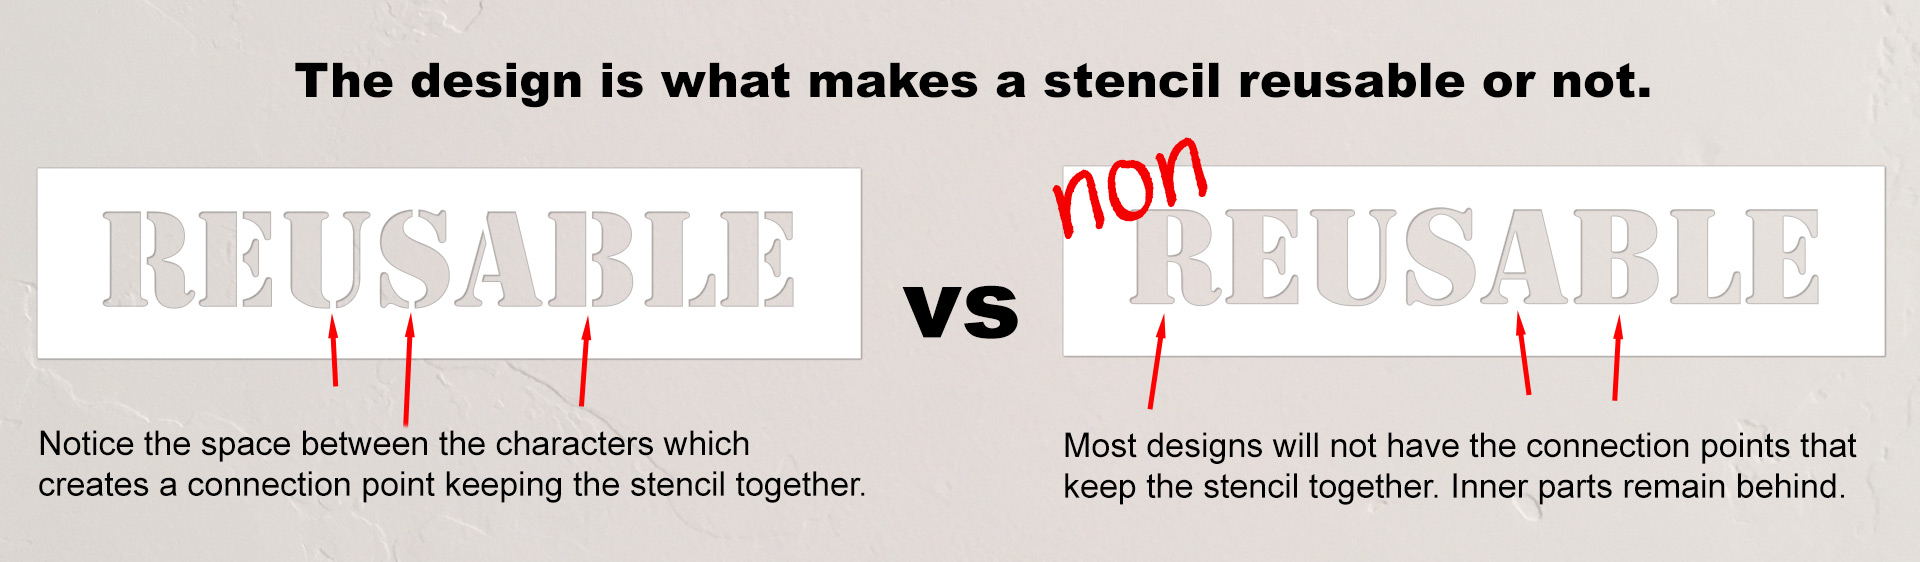 stencil-reusability-example.jpg